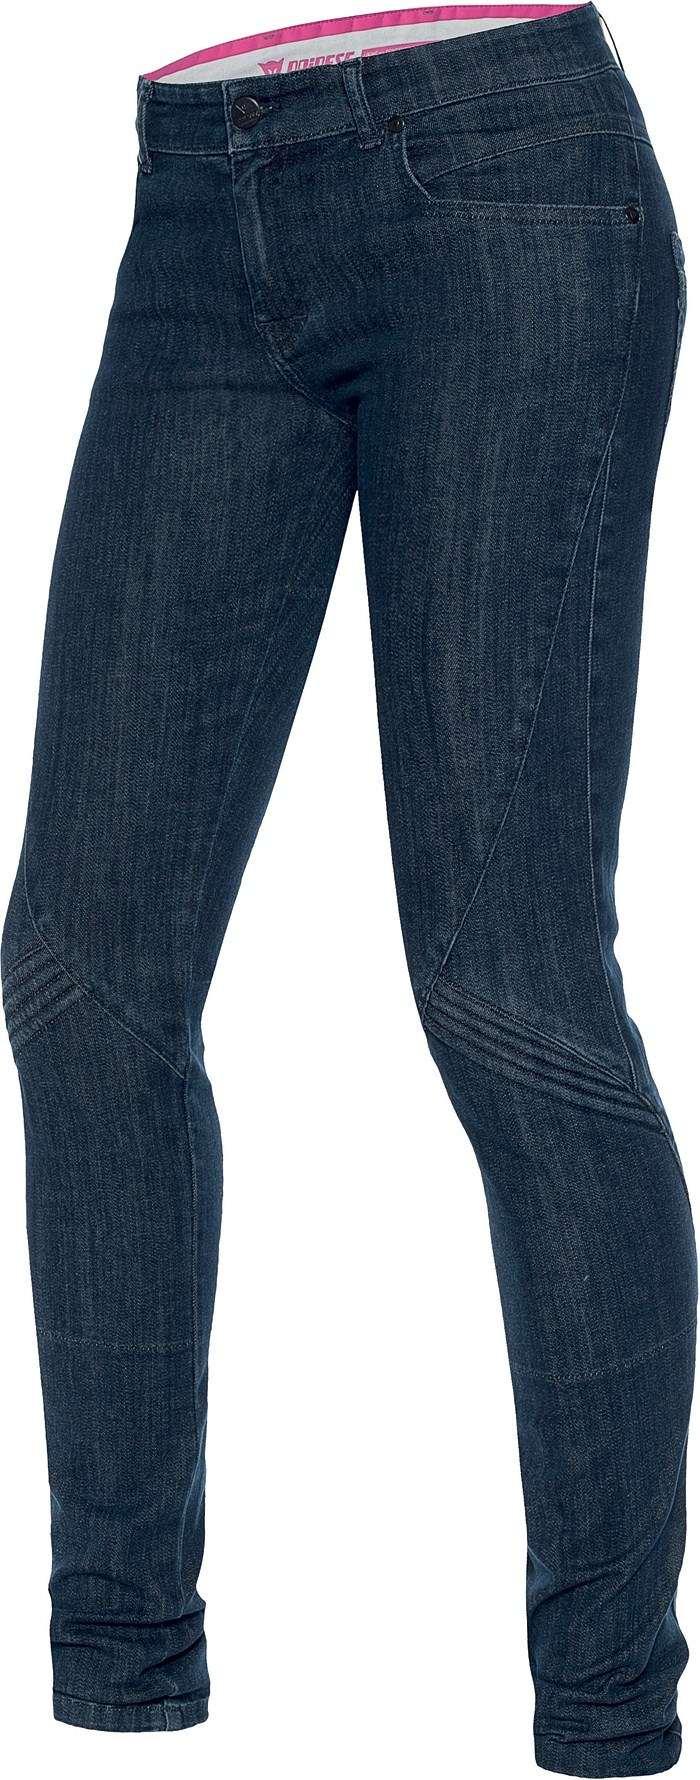 Jeans moto donna Dainese Jessville skinny Denim medio